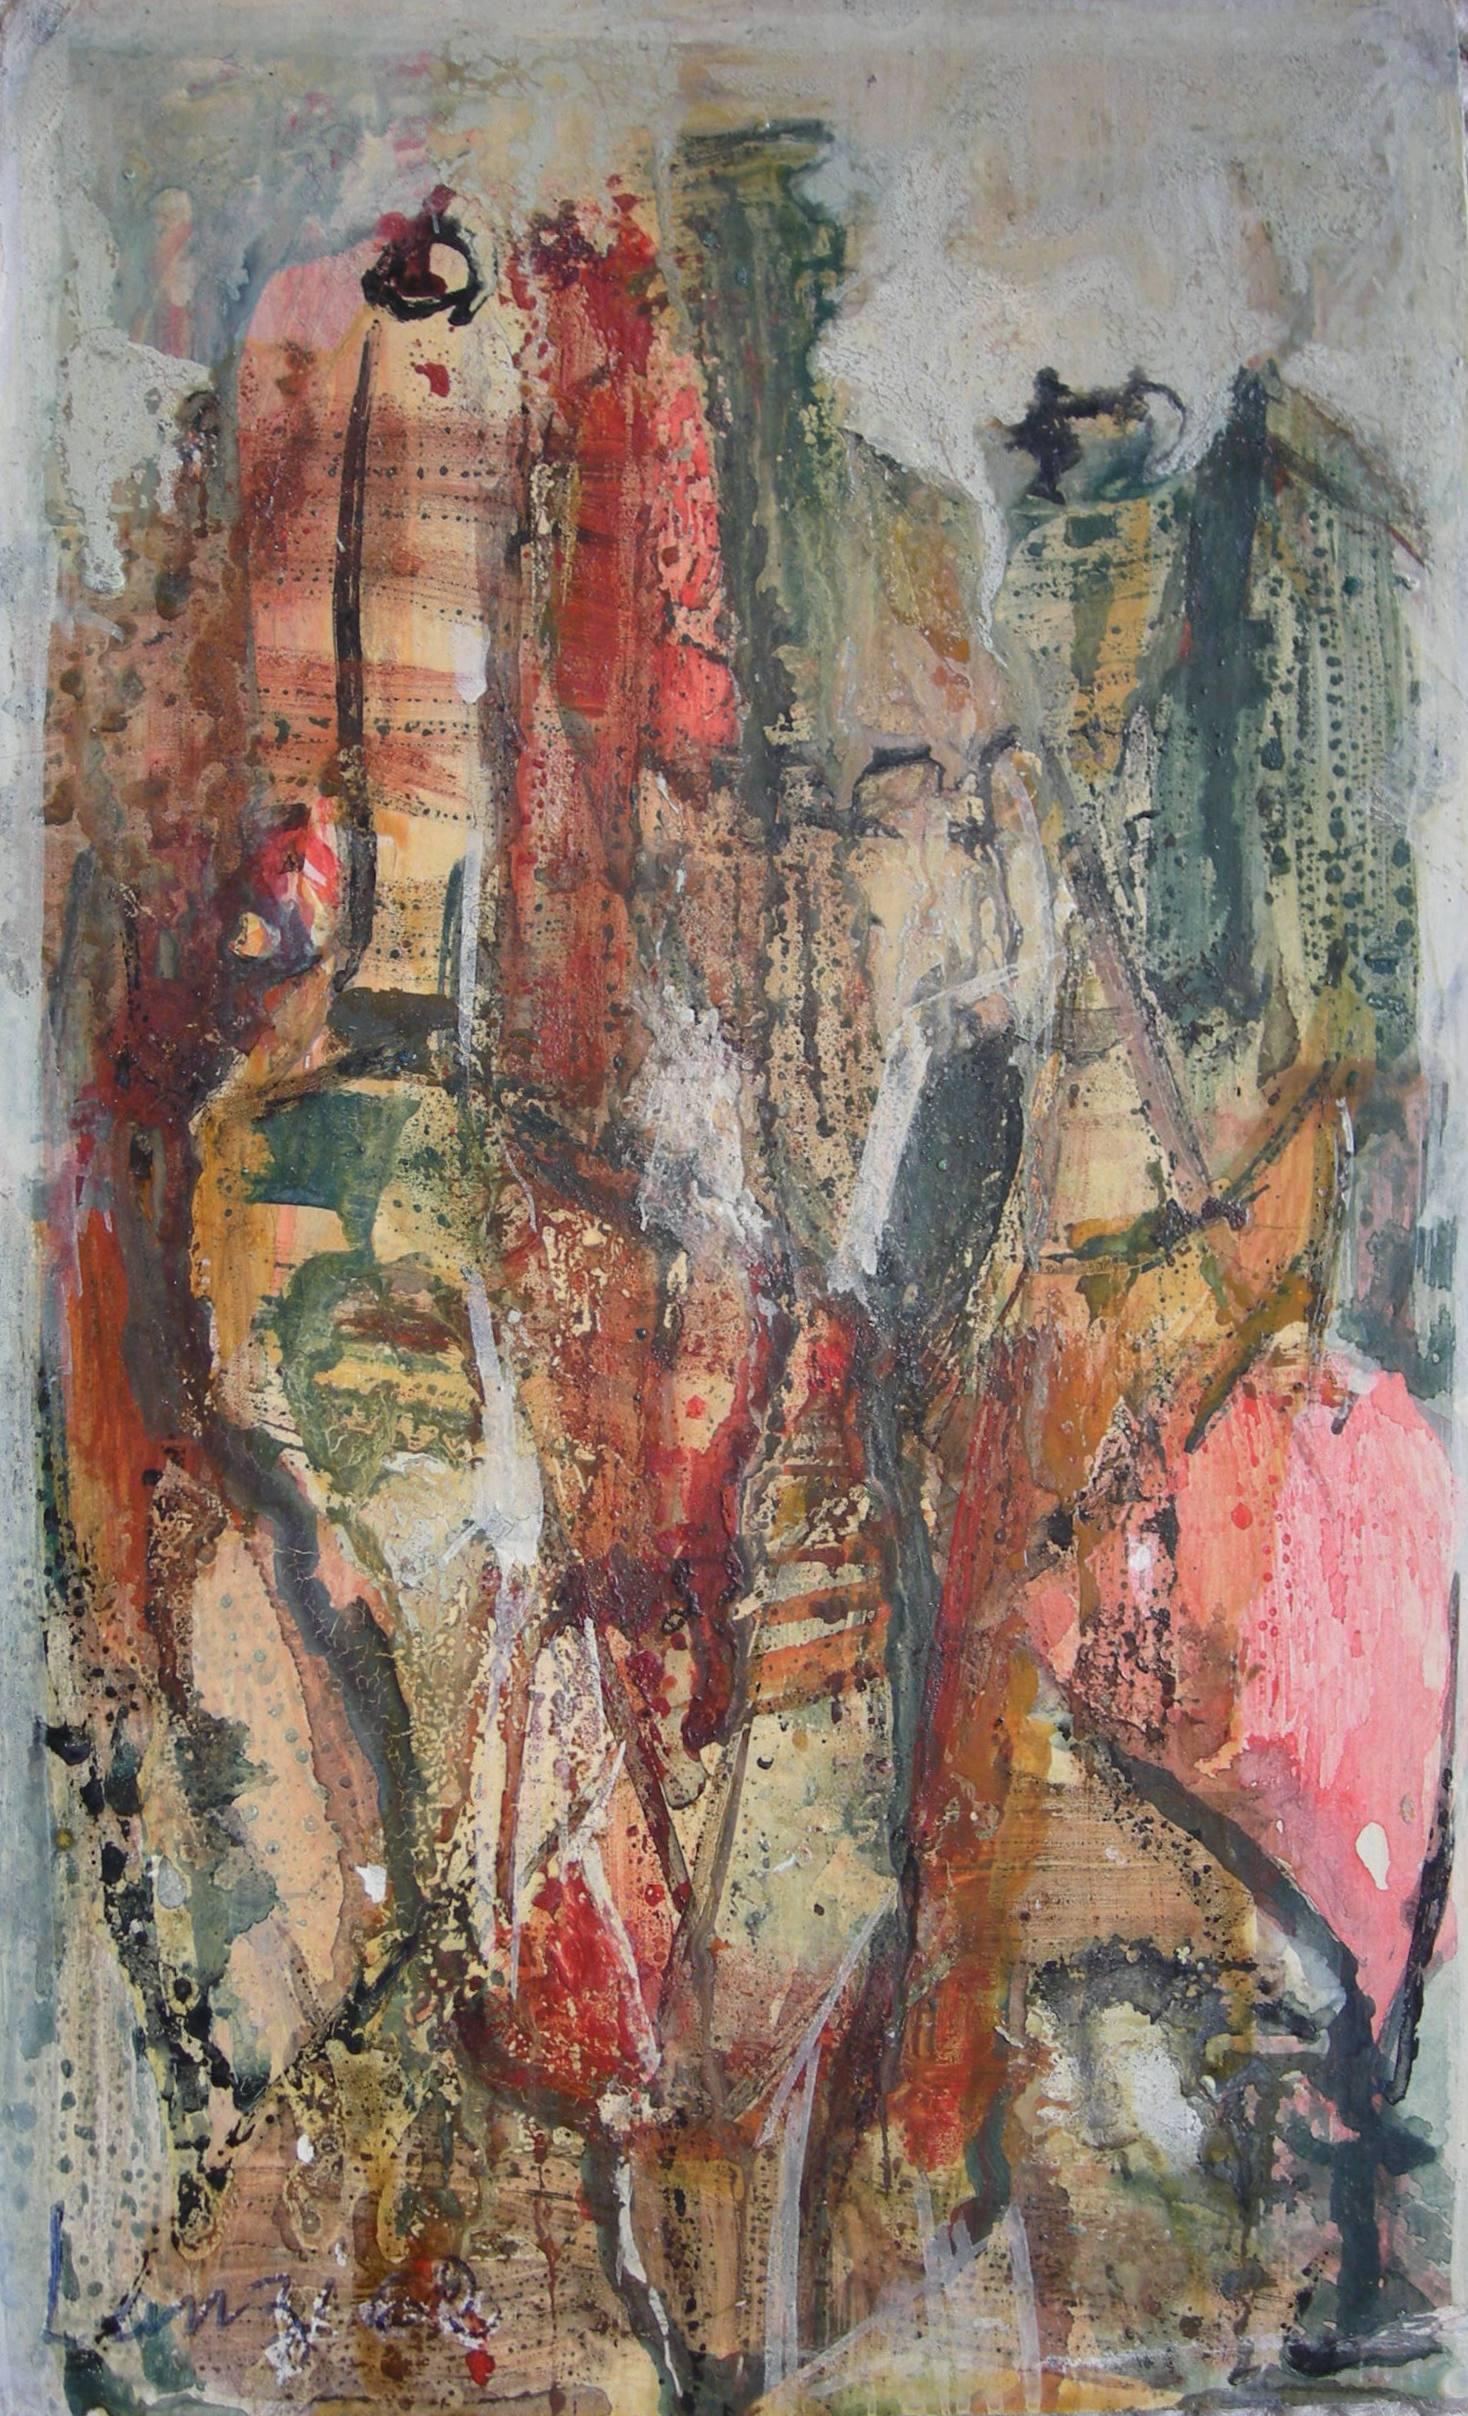 Francois Lanzi - Abstract 1962